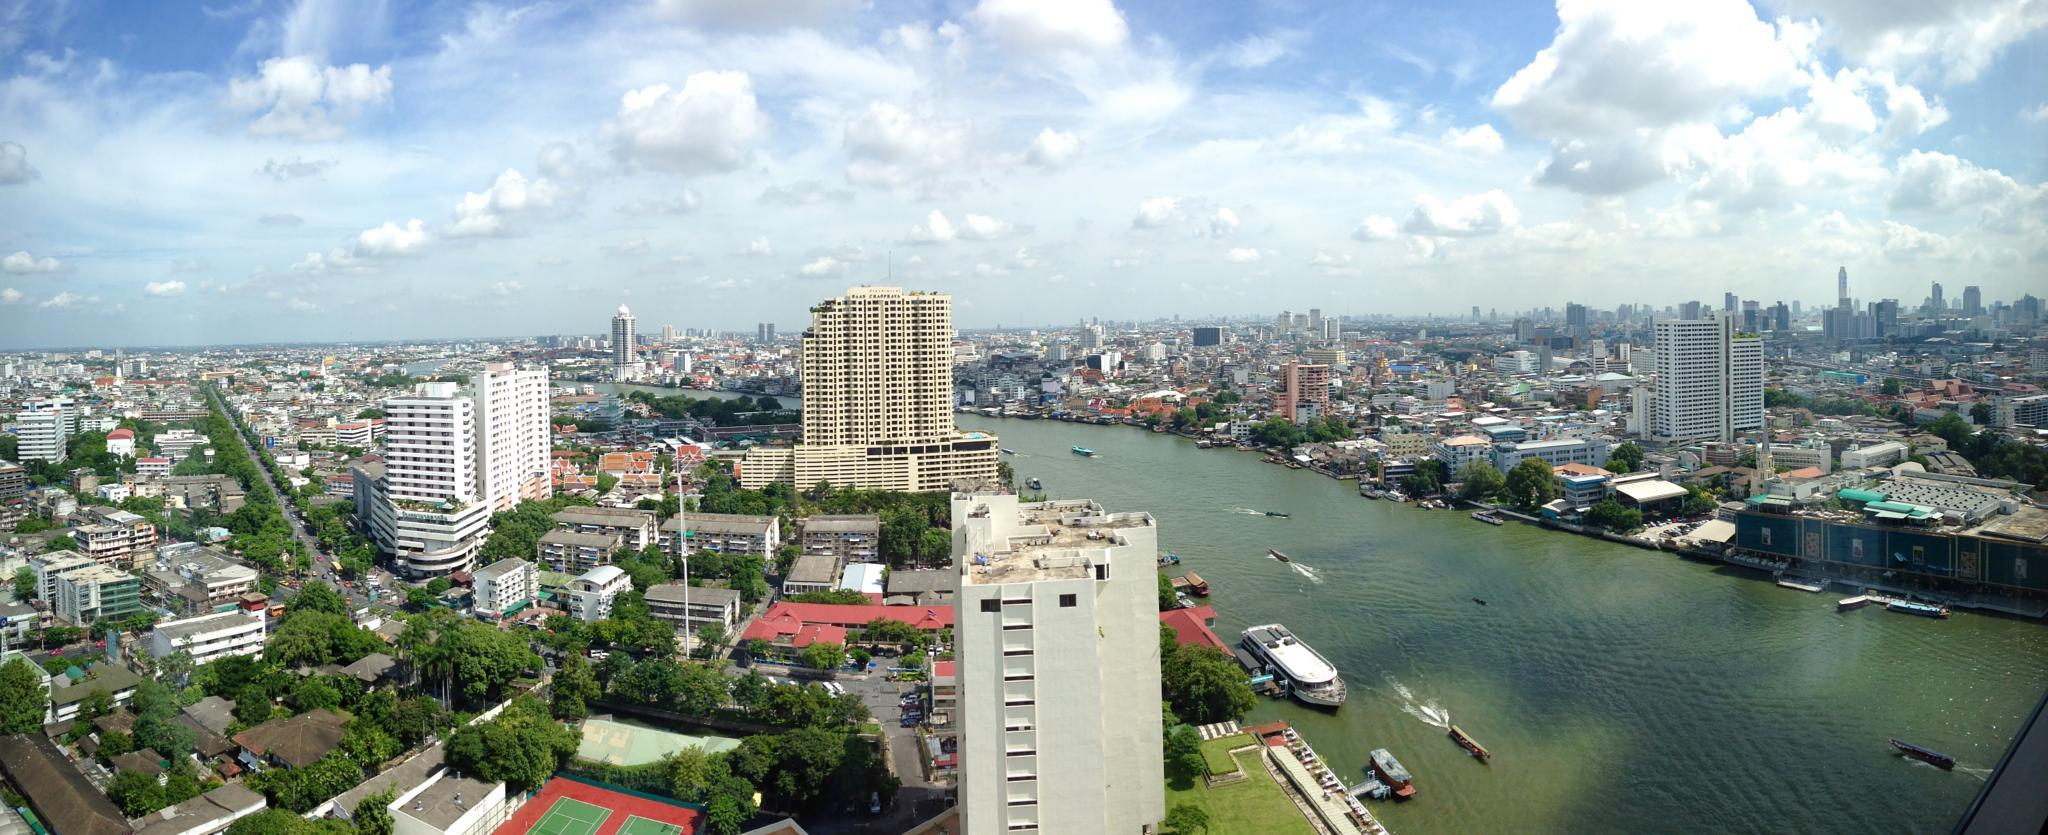 Bangkok view by Thomas Ryste